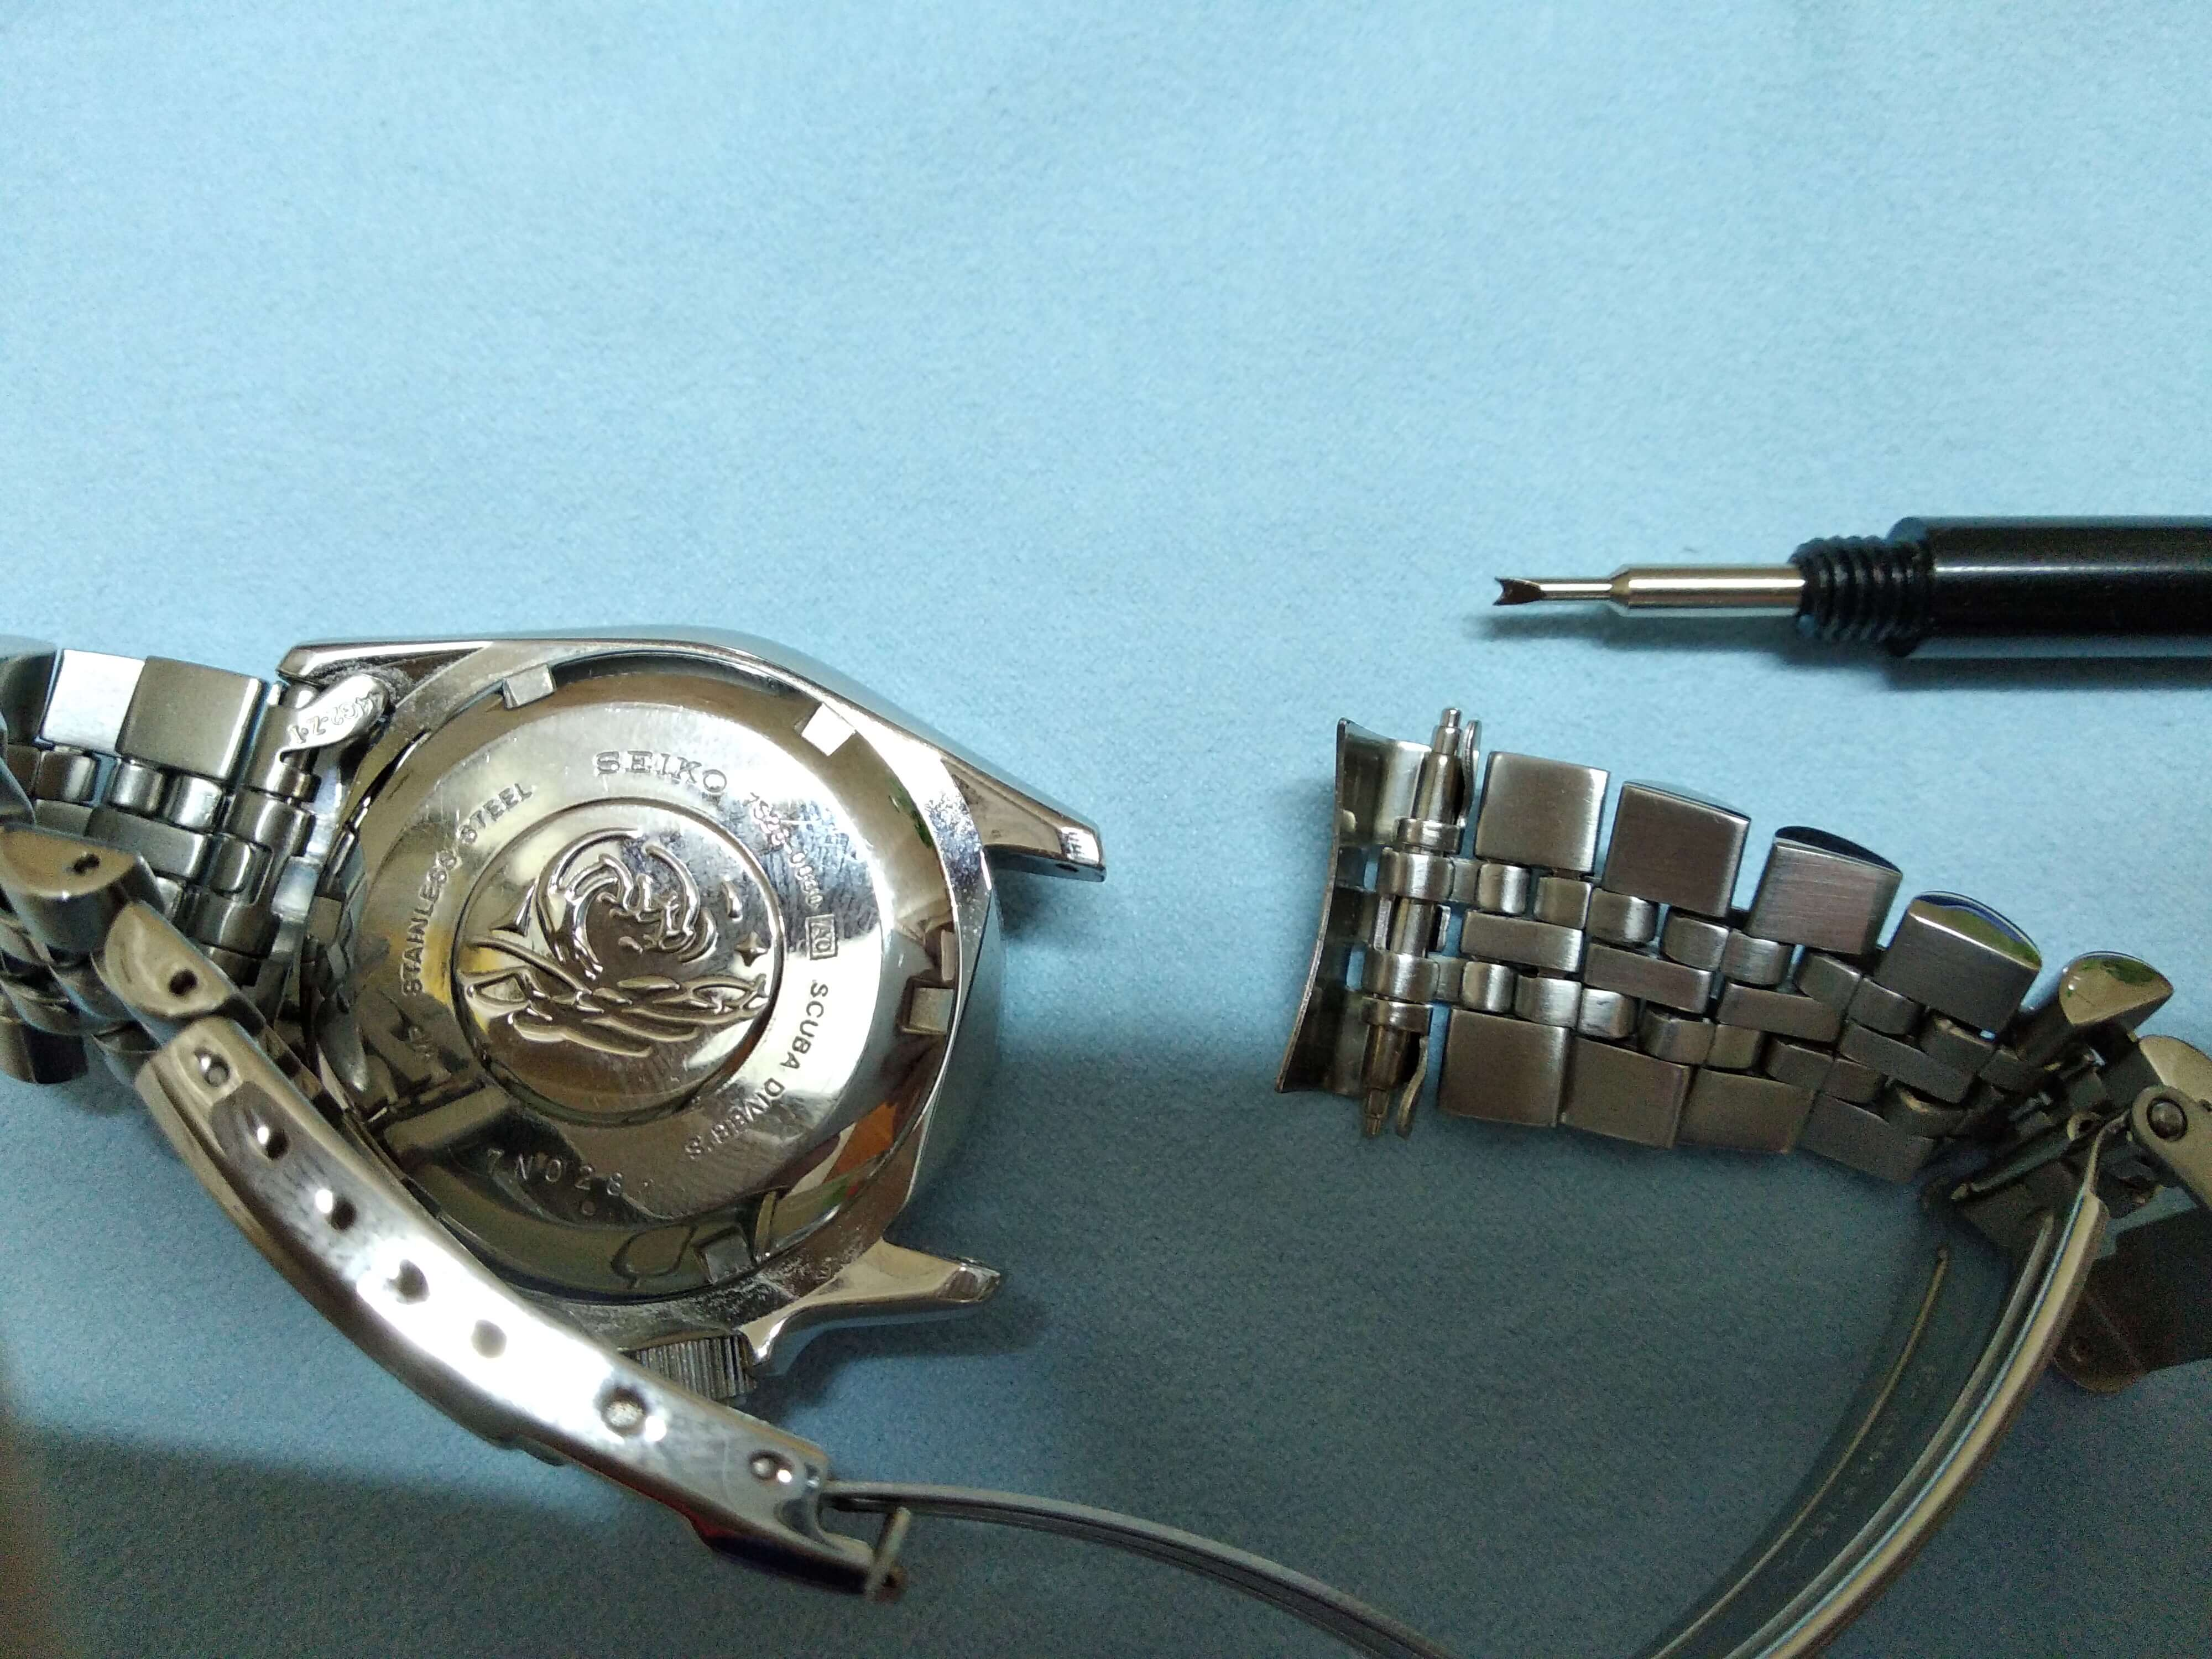 Seiko SKX013 Bracelet spring bar